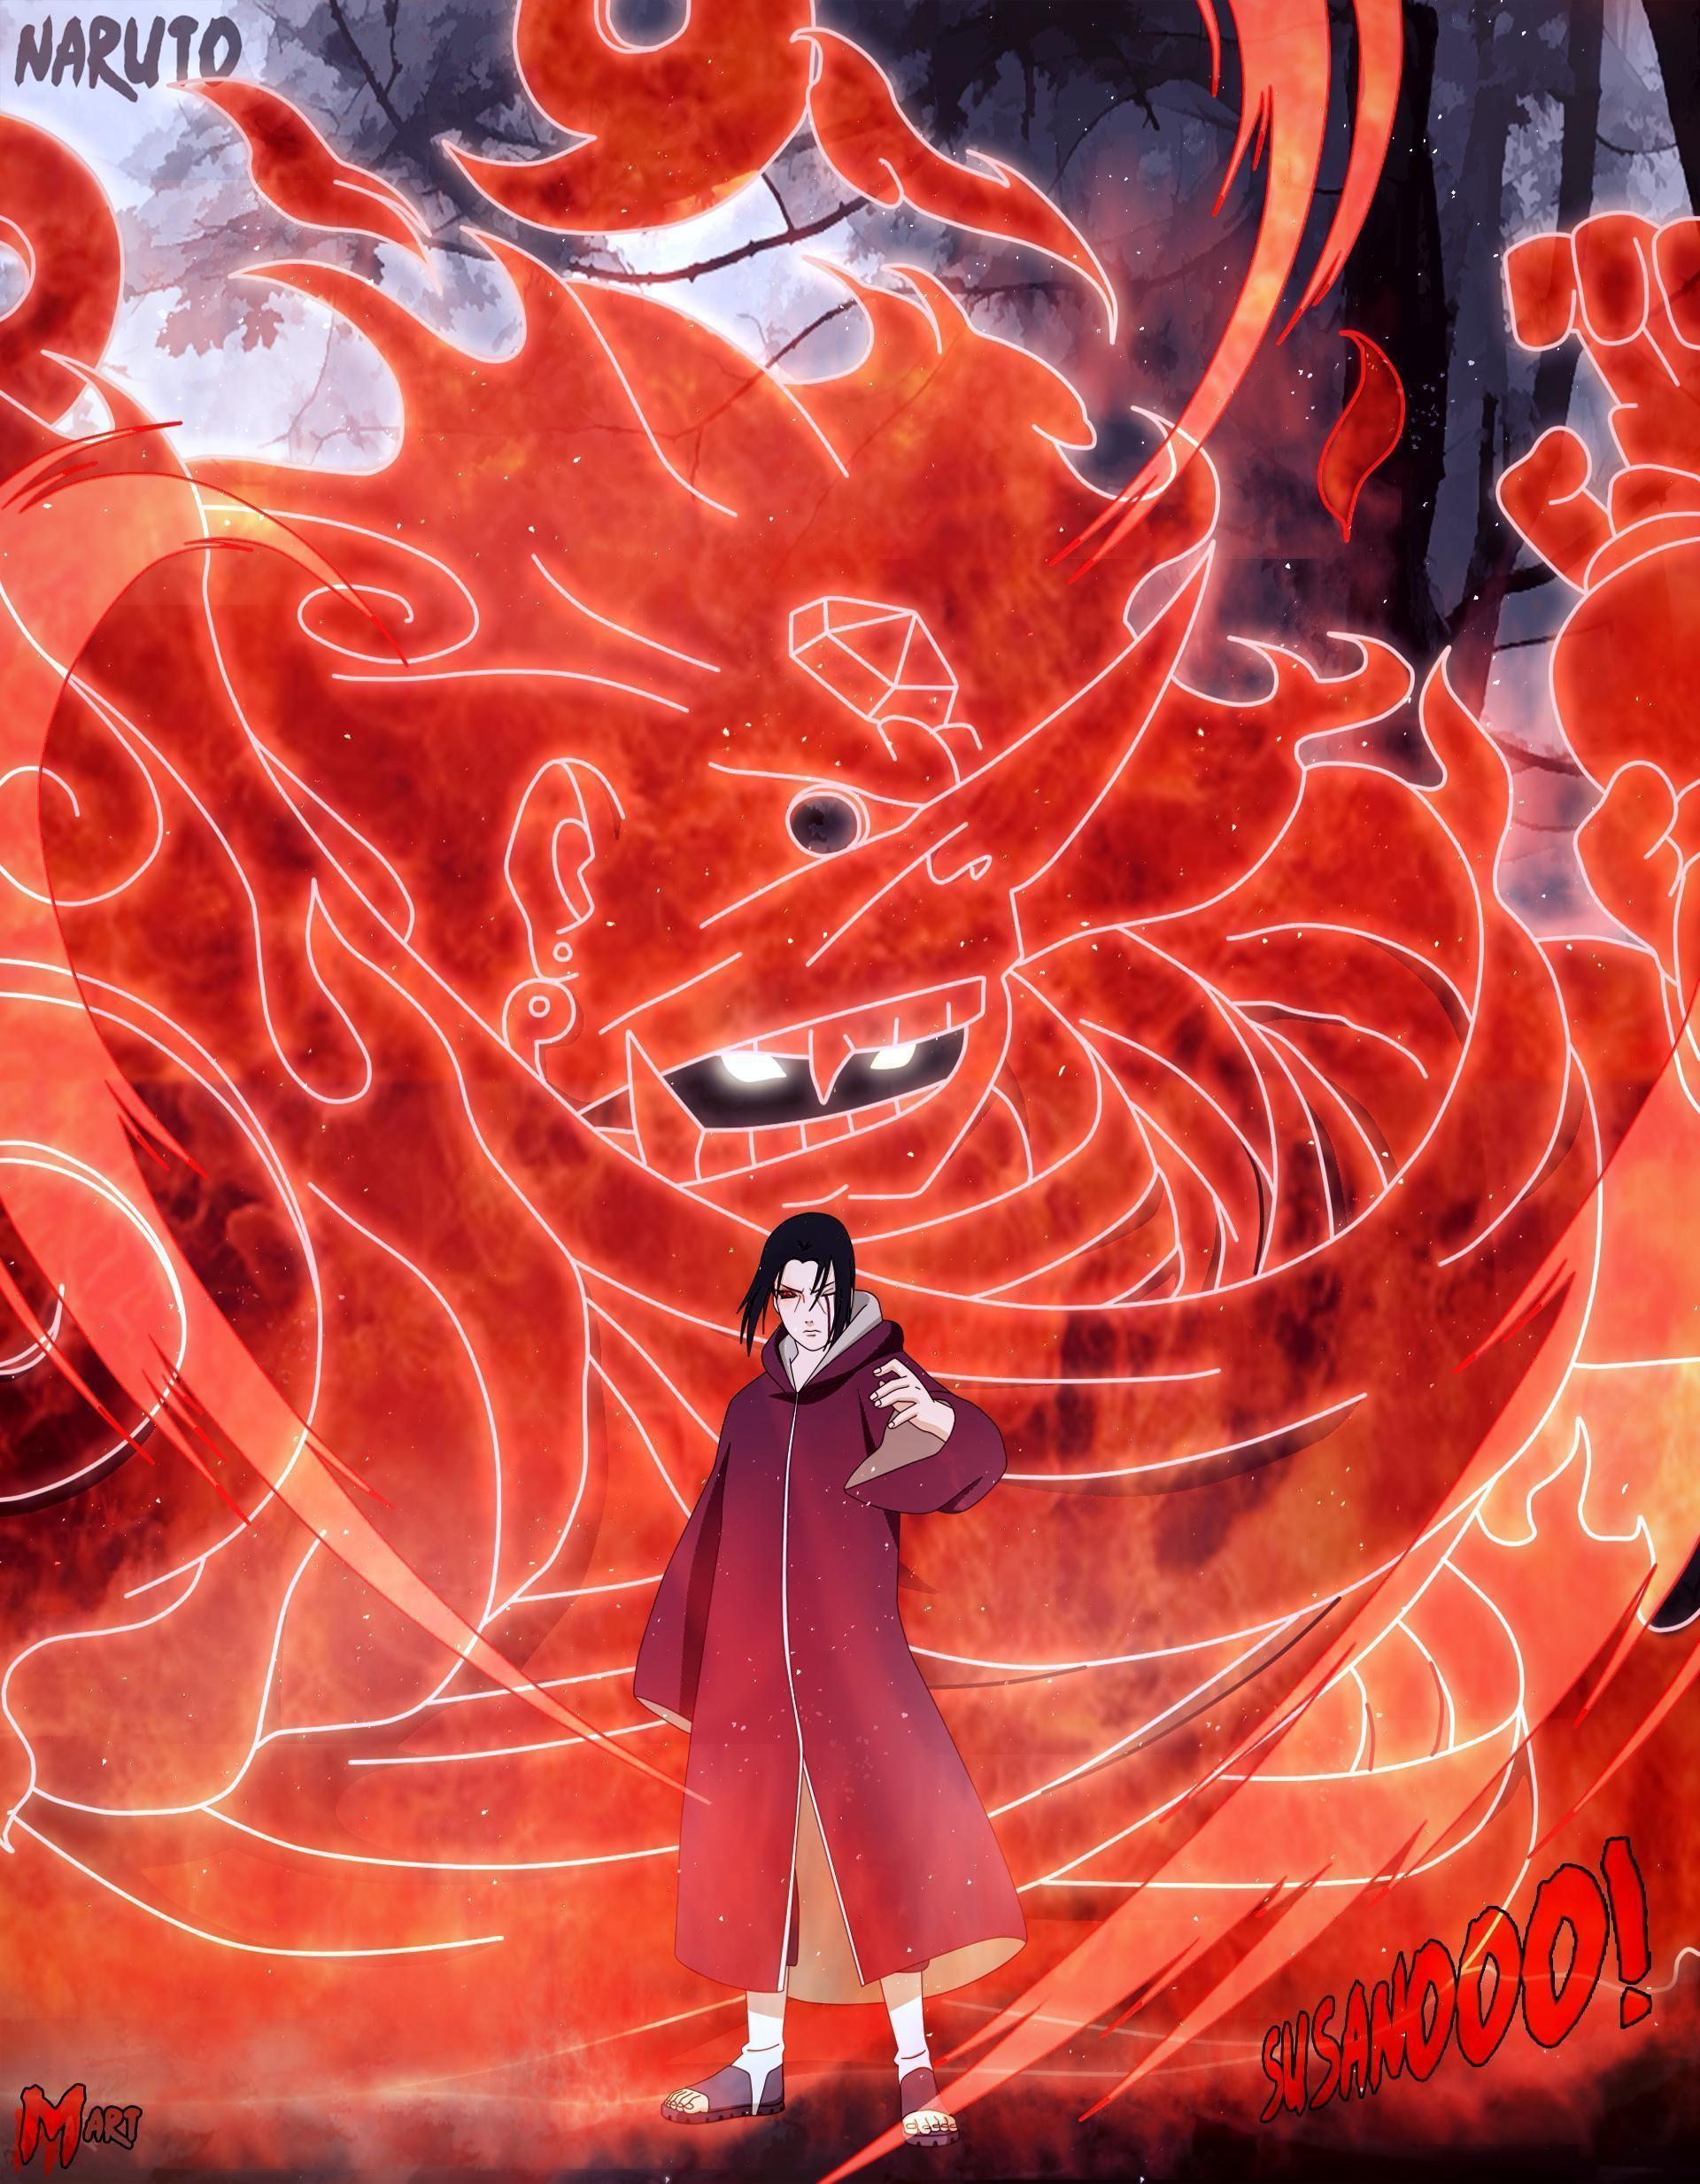 1920x2466 Images For Naruto Itachi Susanoo Wallpaper